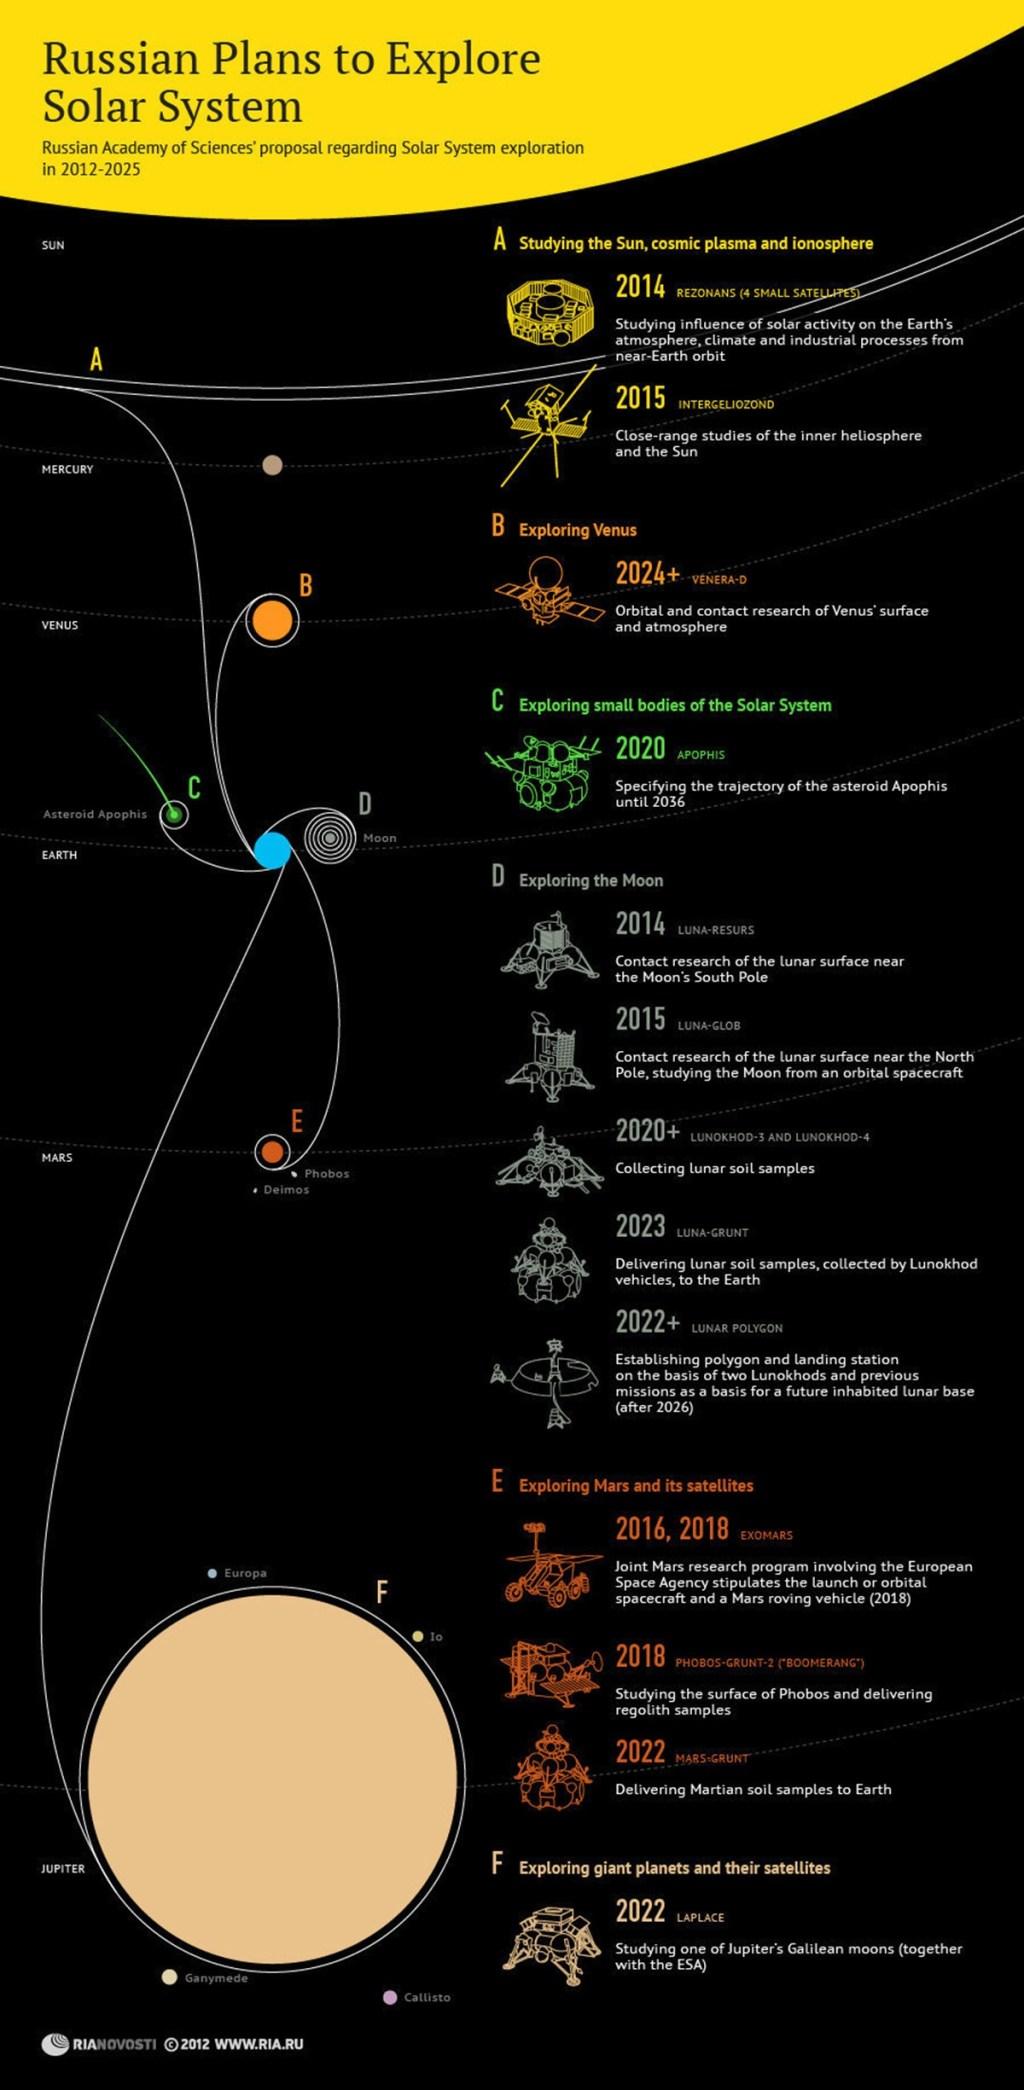 00 RIA-Novosti Inforgraphics. Russian Plans to Explore the ...